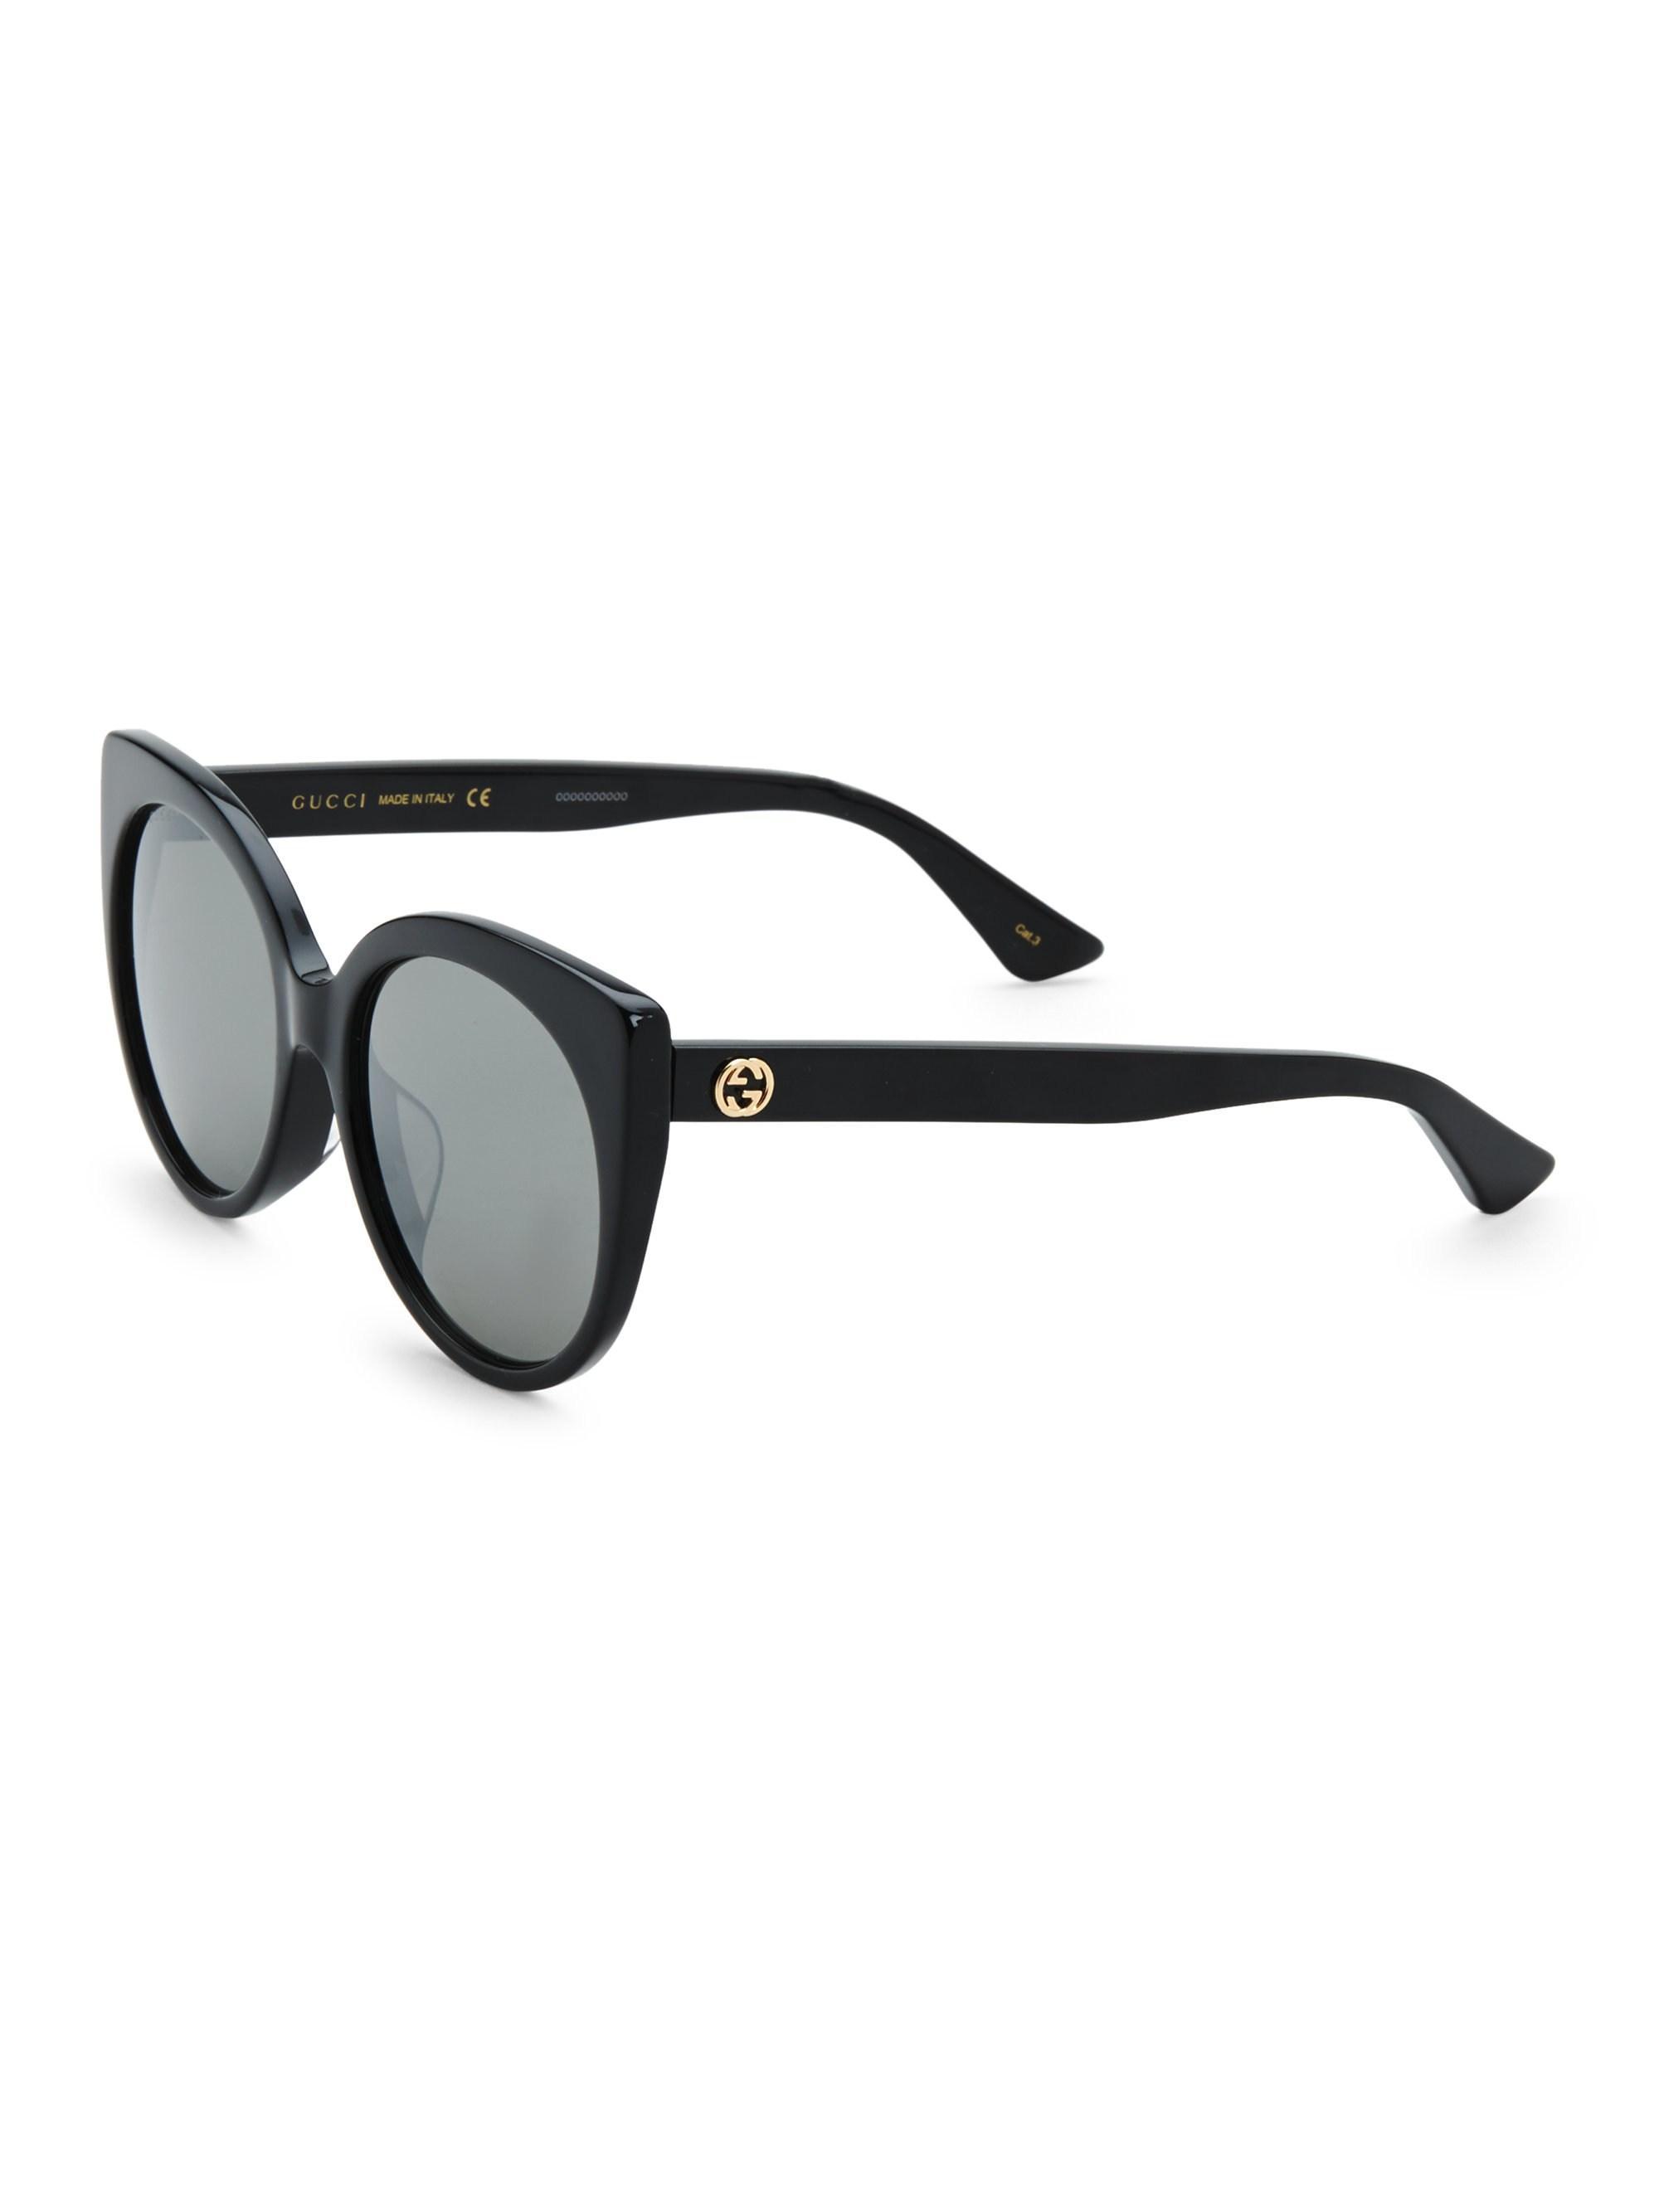 1ed35d91a6 Gucci - Black Urban 57mm Cat Eye Sunglasses - Lyst. View fullscreen